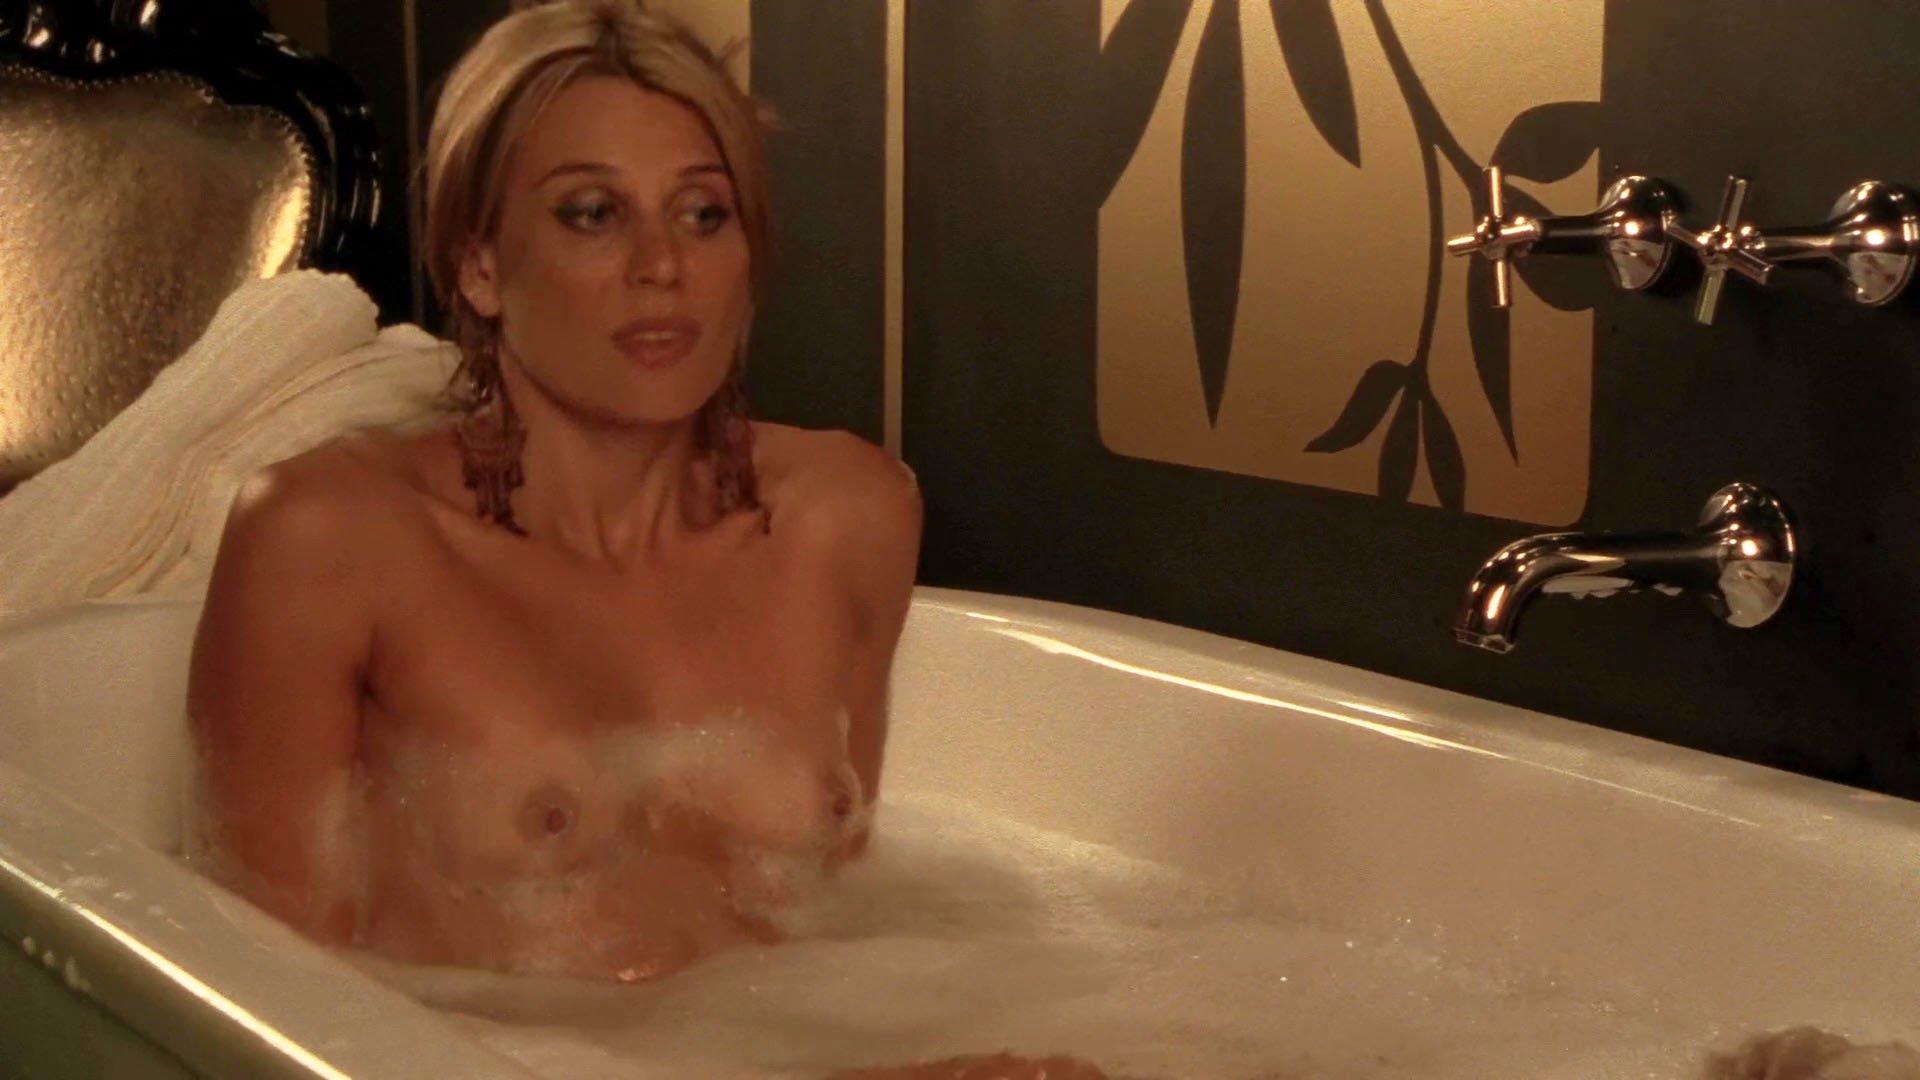 Diana Glenn nude - Satisfaction s01 (2007)